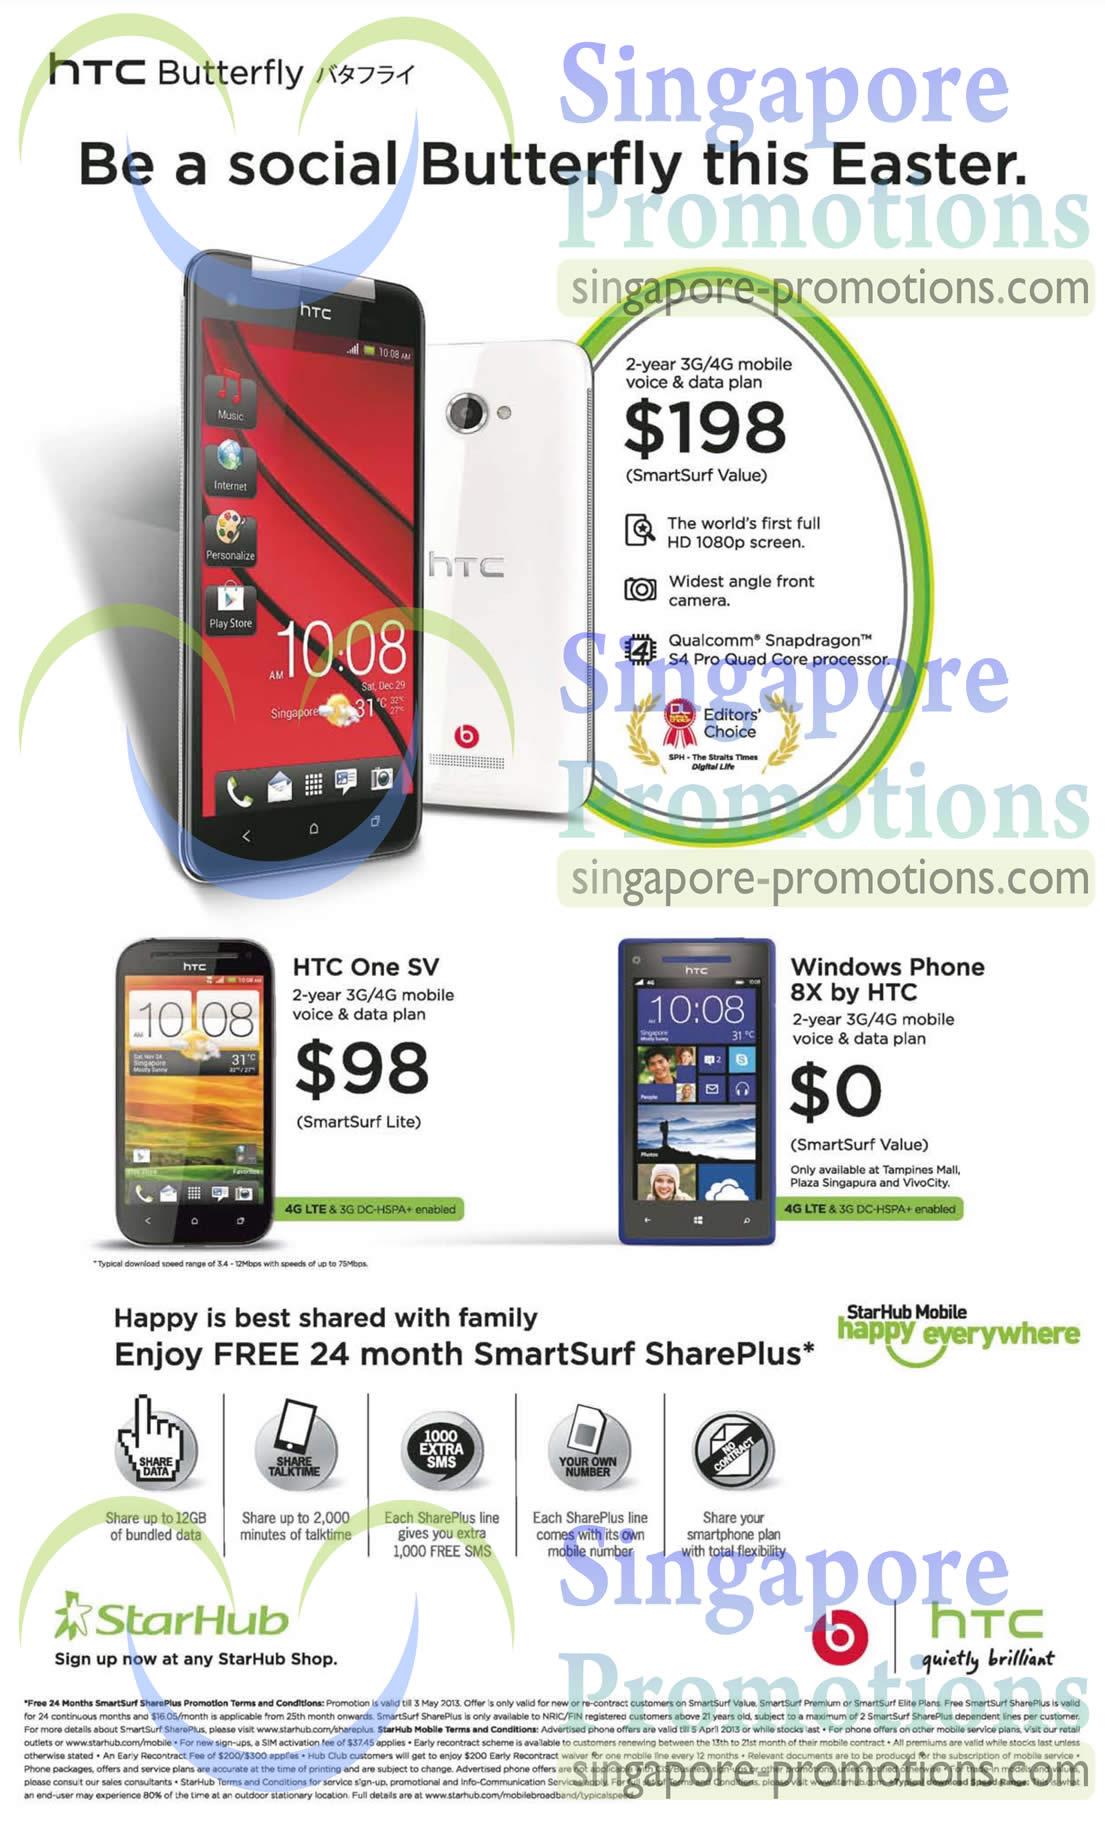 HTC Butterfly, HTC One SV, HTC Windows Phone 8X